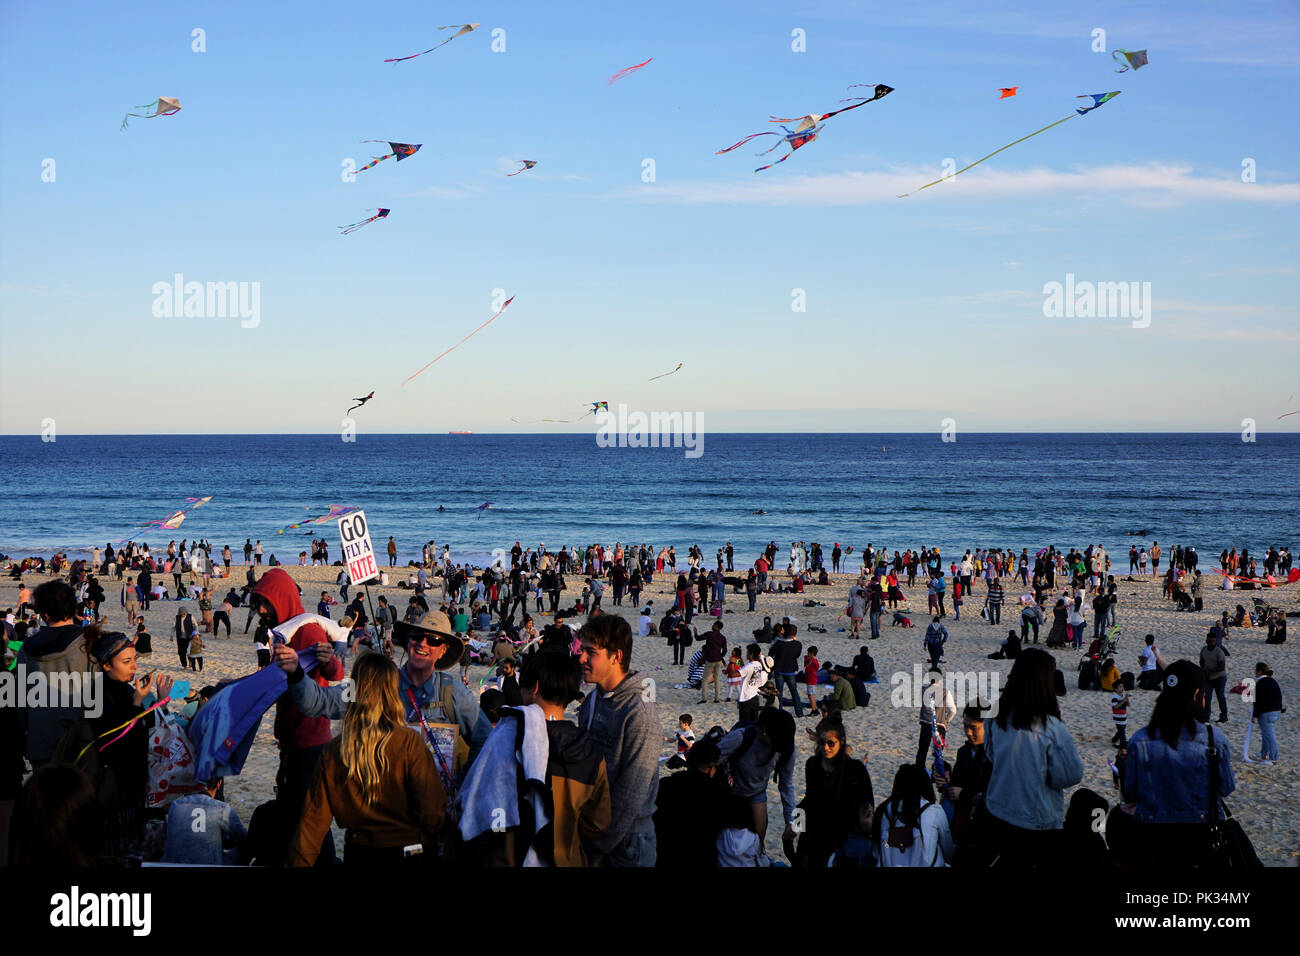 Flying Kites at the Festival of the Winds at Bondi Beach, Australia - Stock Image